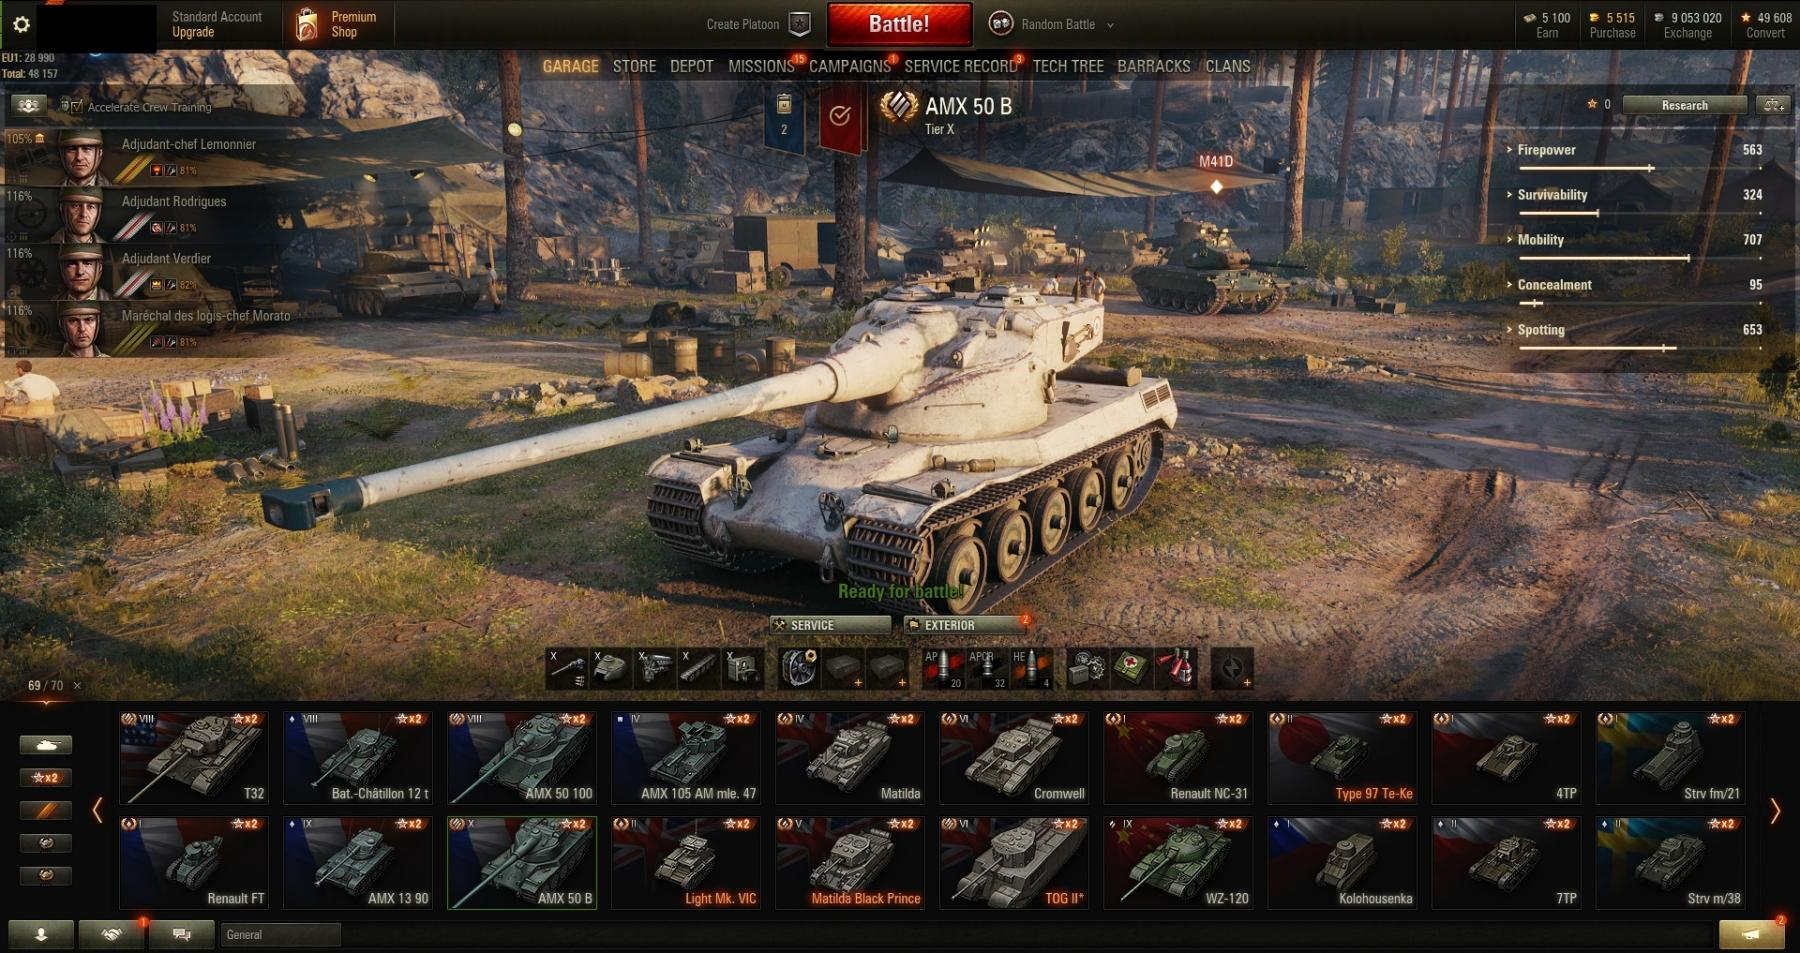 Personal Rating:5253! Victories:48,98%! 69 TANKS: FCM 36 Pak 40, 8,8 cm Pak 43 Jagdtiger! Gold: 5 515!!